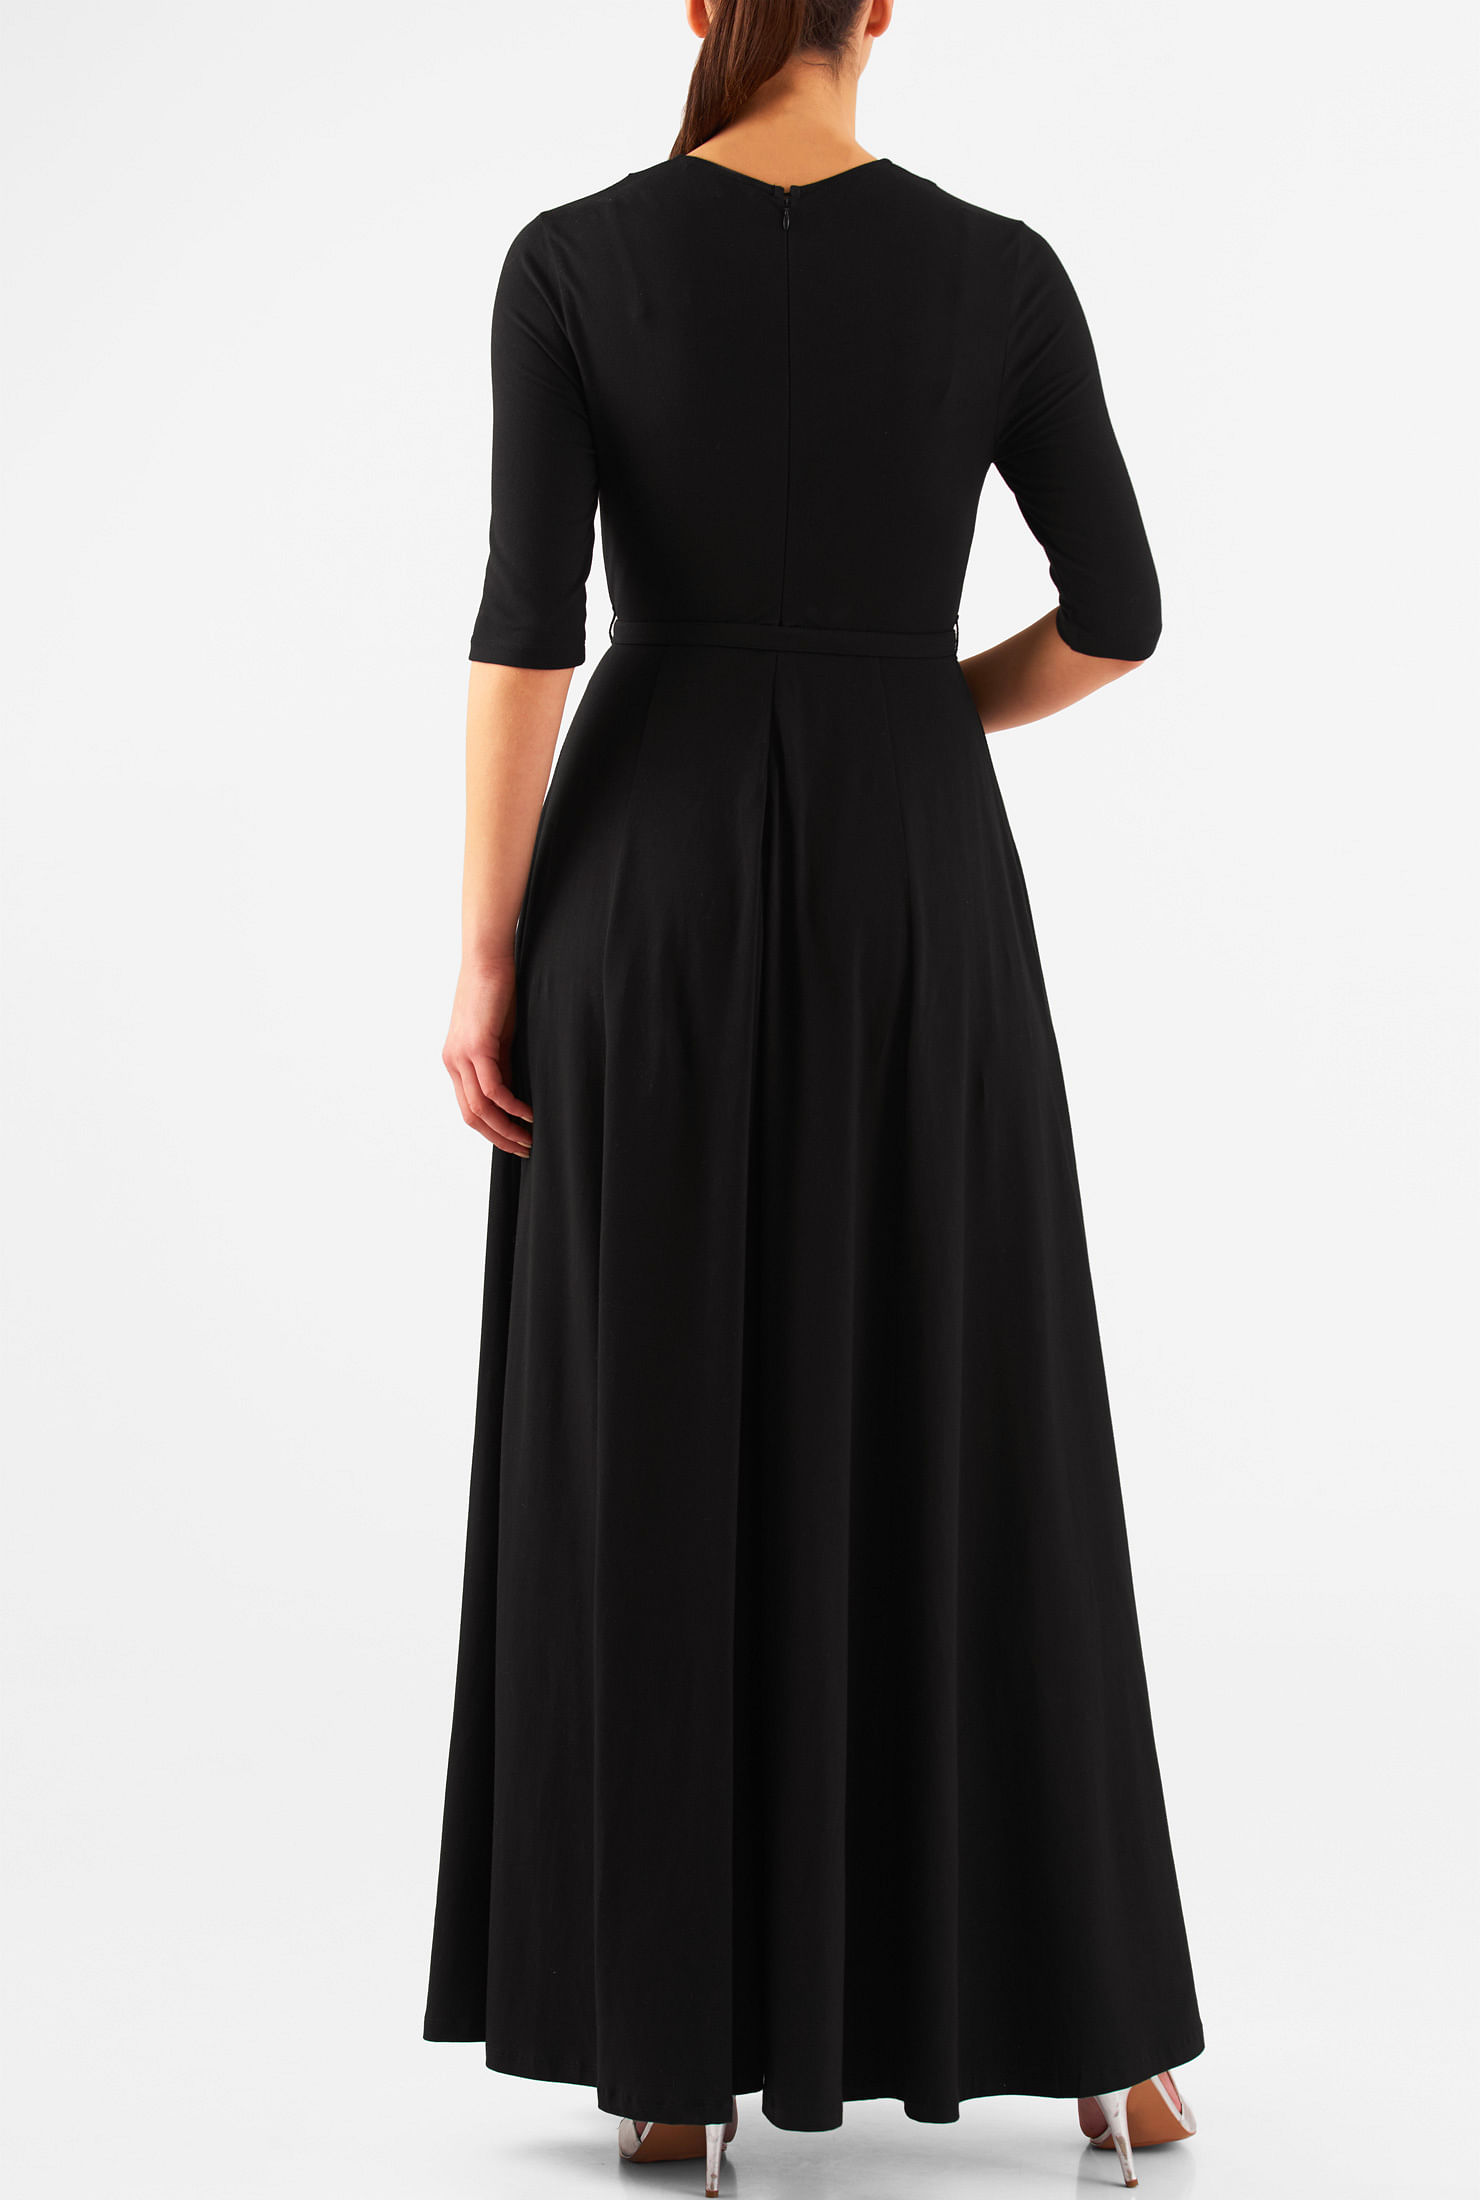 Women&-39-s Fashion Clothing 0-36W and Custom